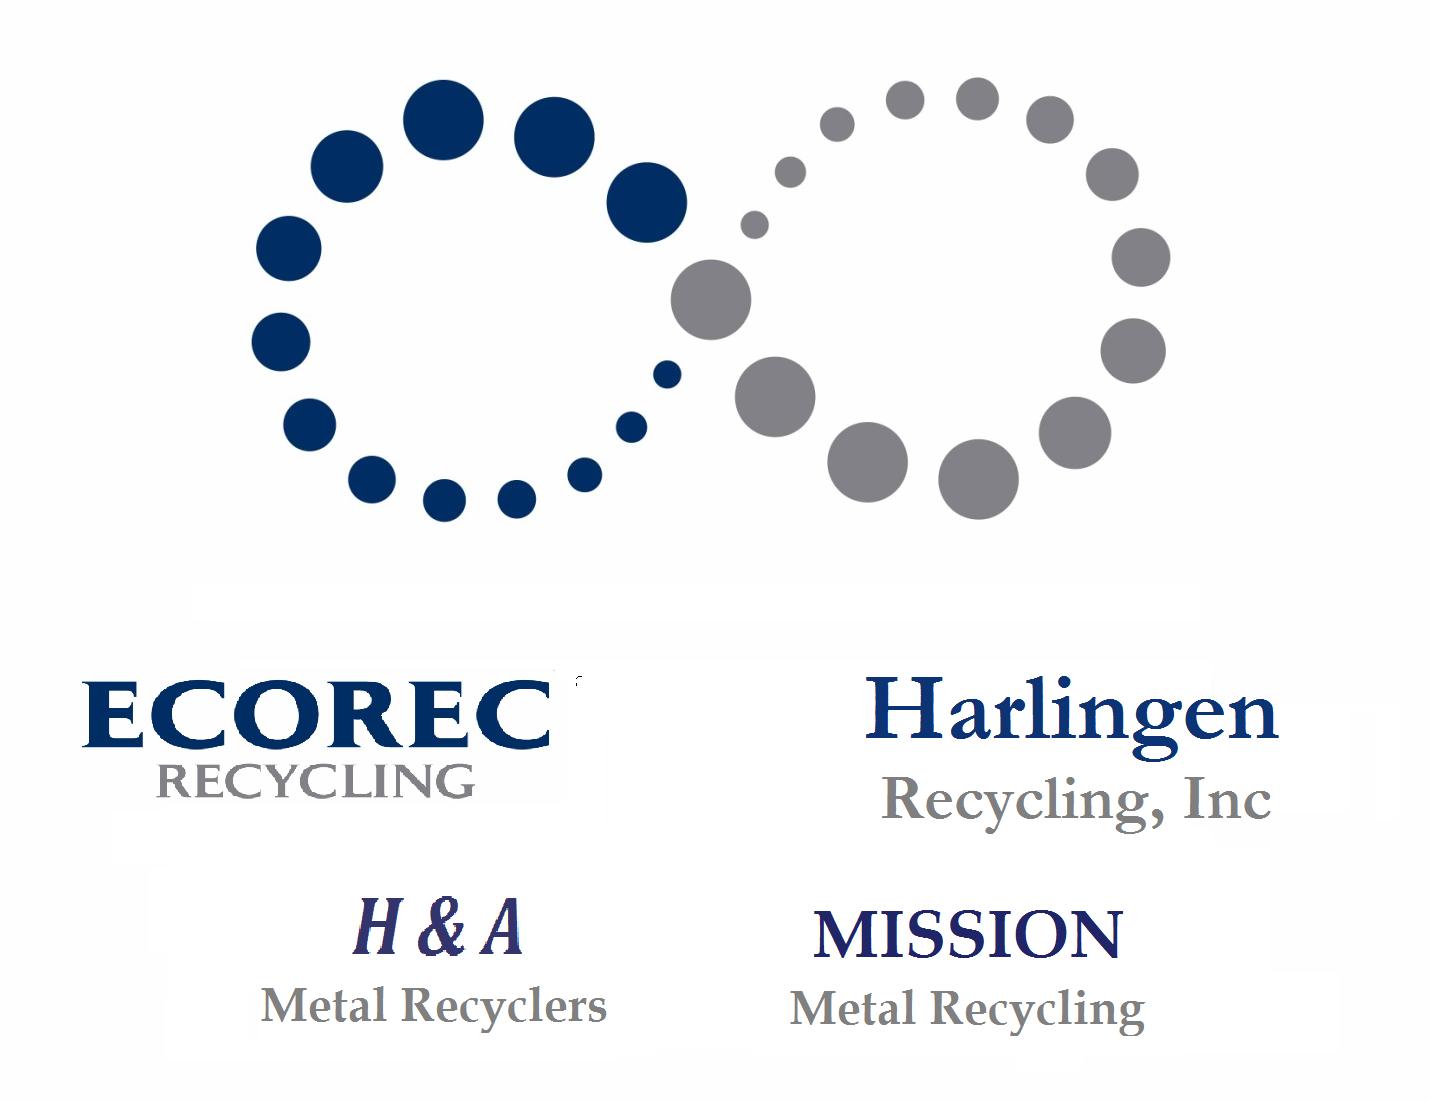 harlingen recycling inc in harlingen tx scrap metals. Black Bedroom Furniture Sets. Home Design Ideas